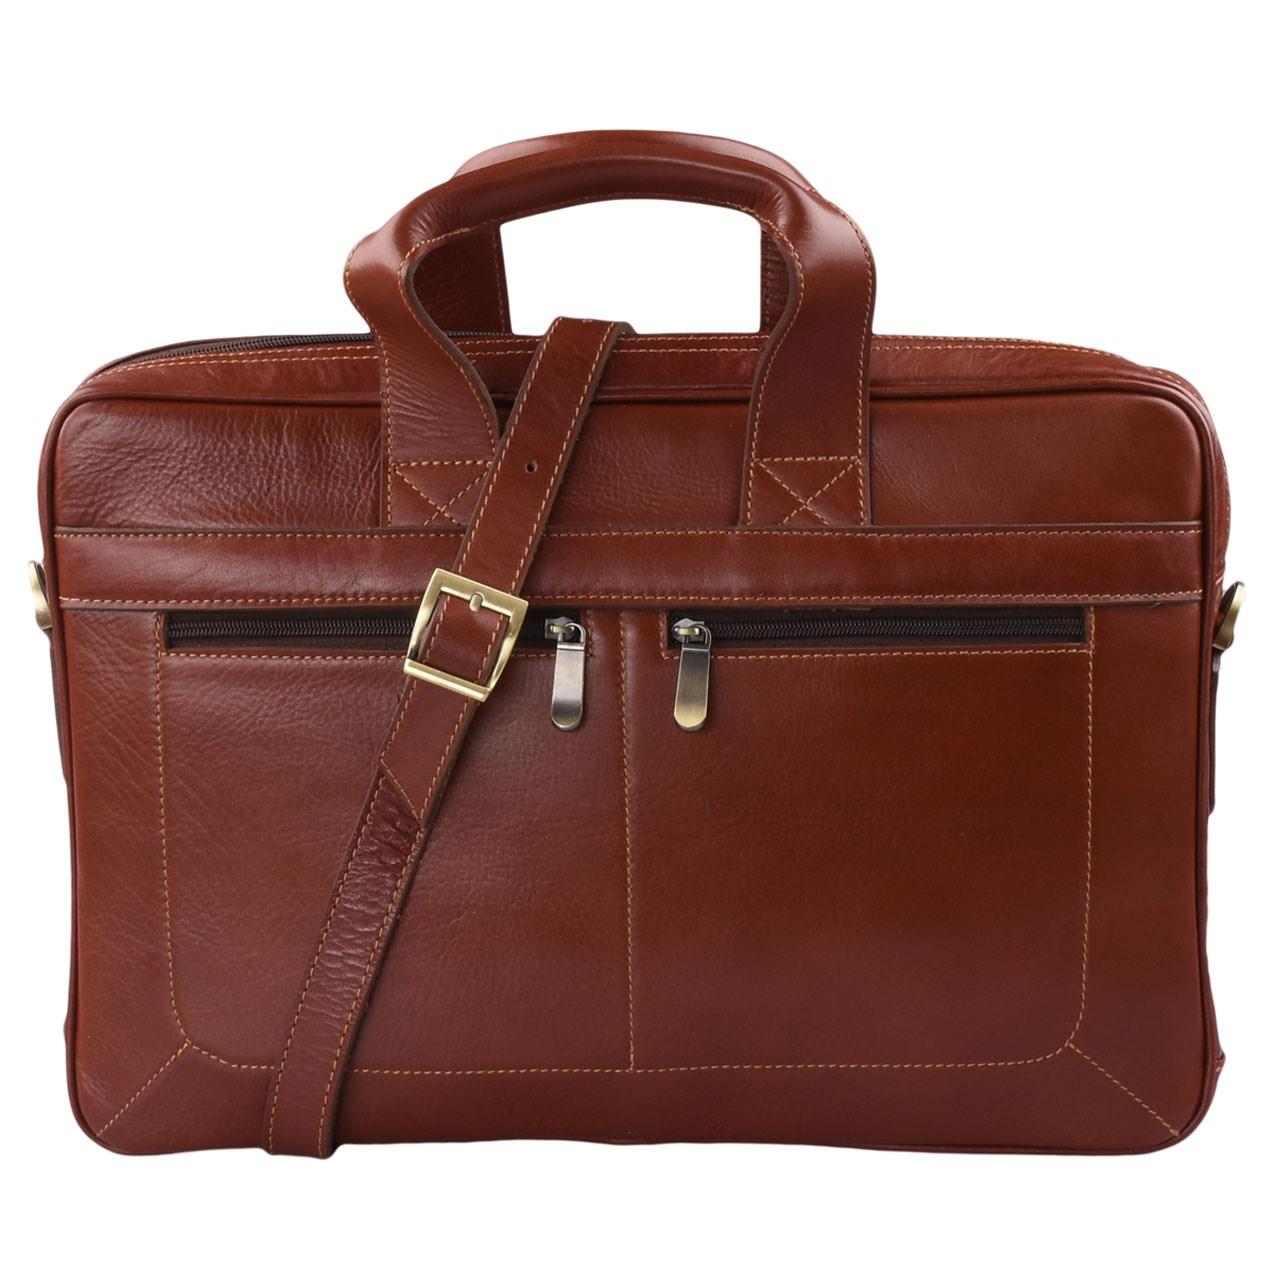 کیف اداری چرم طبیعی کهن چرم مدل LZ15